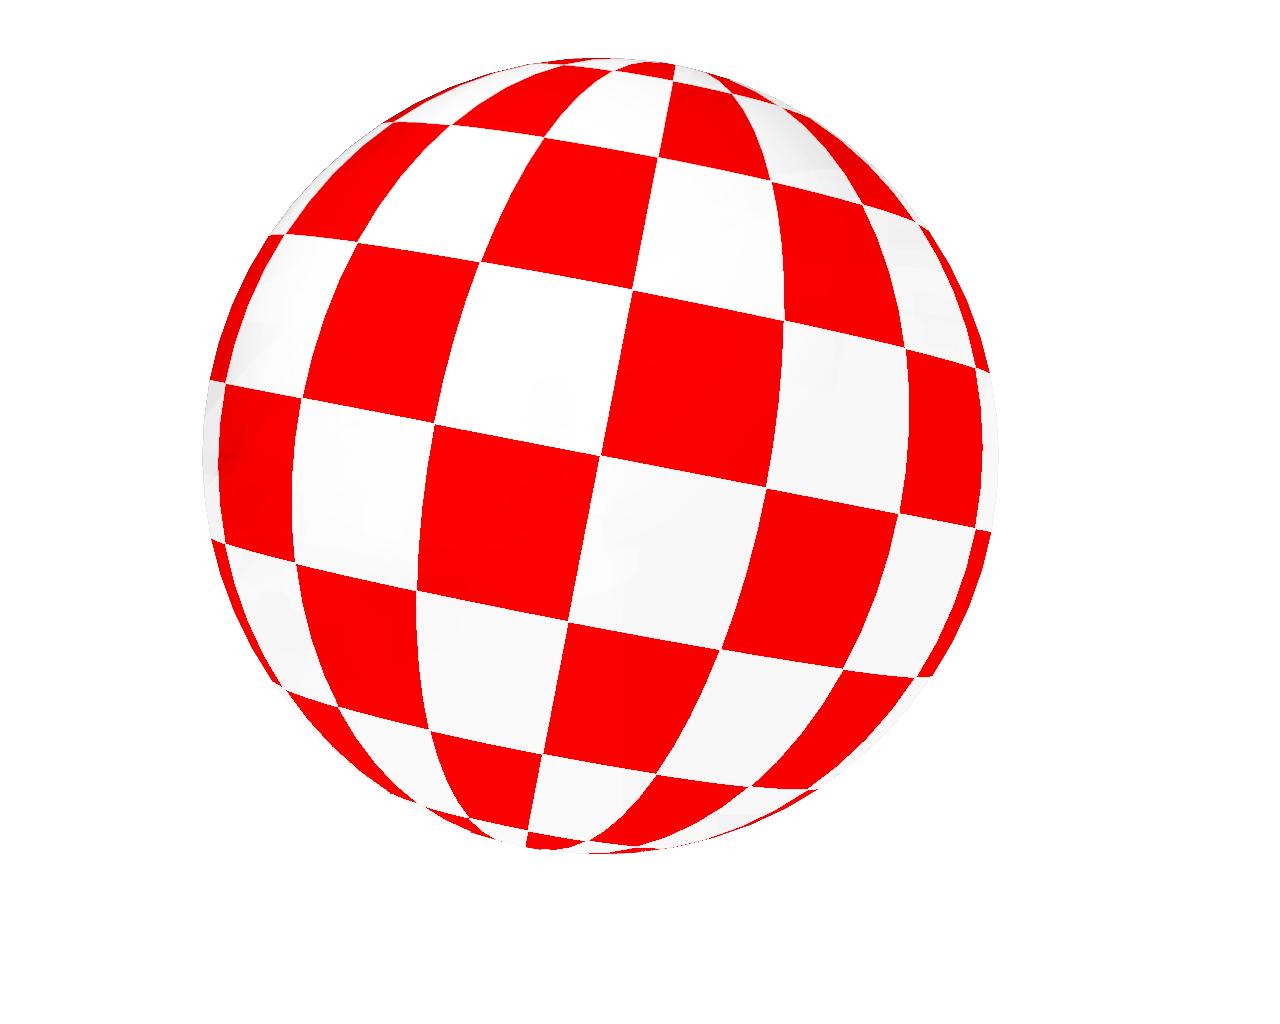 Hi-Res Amiga Boing Ball - No Shadows